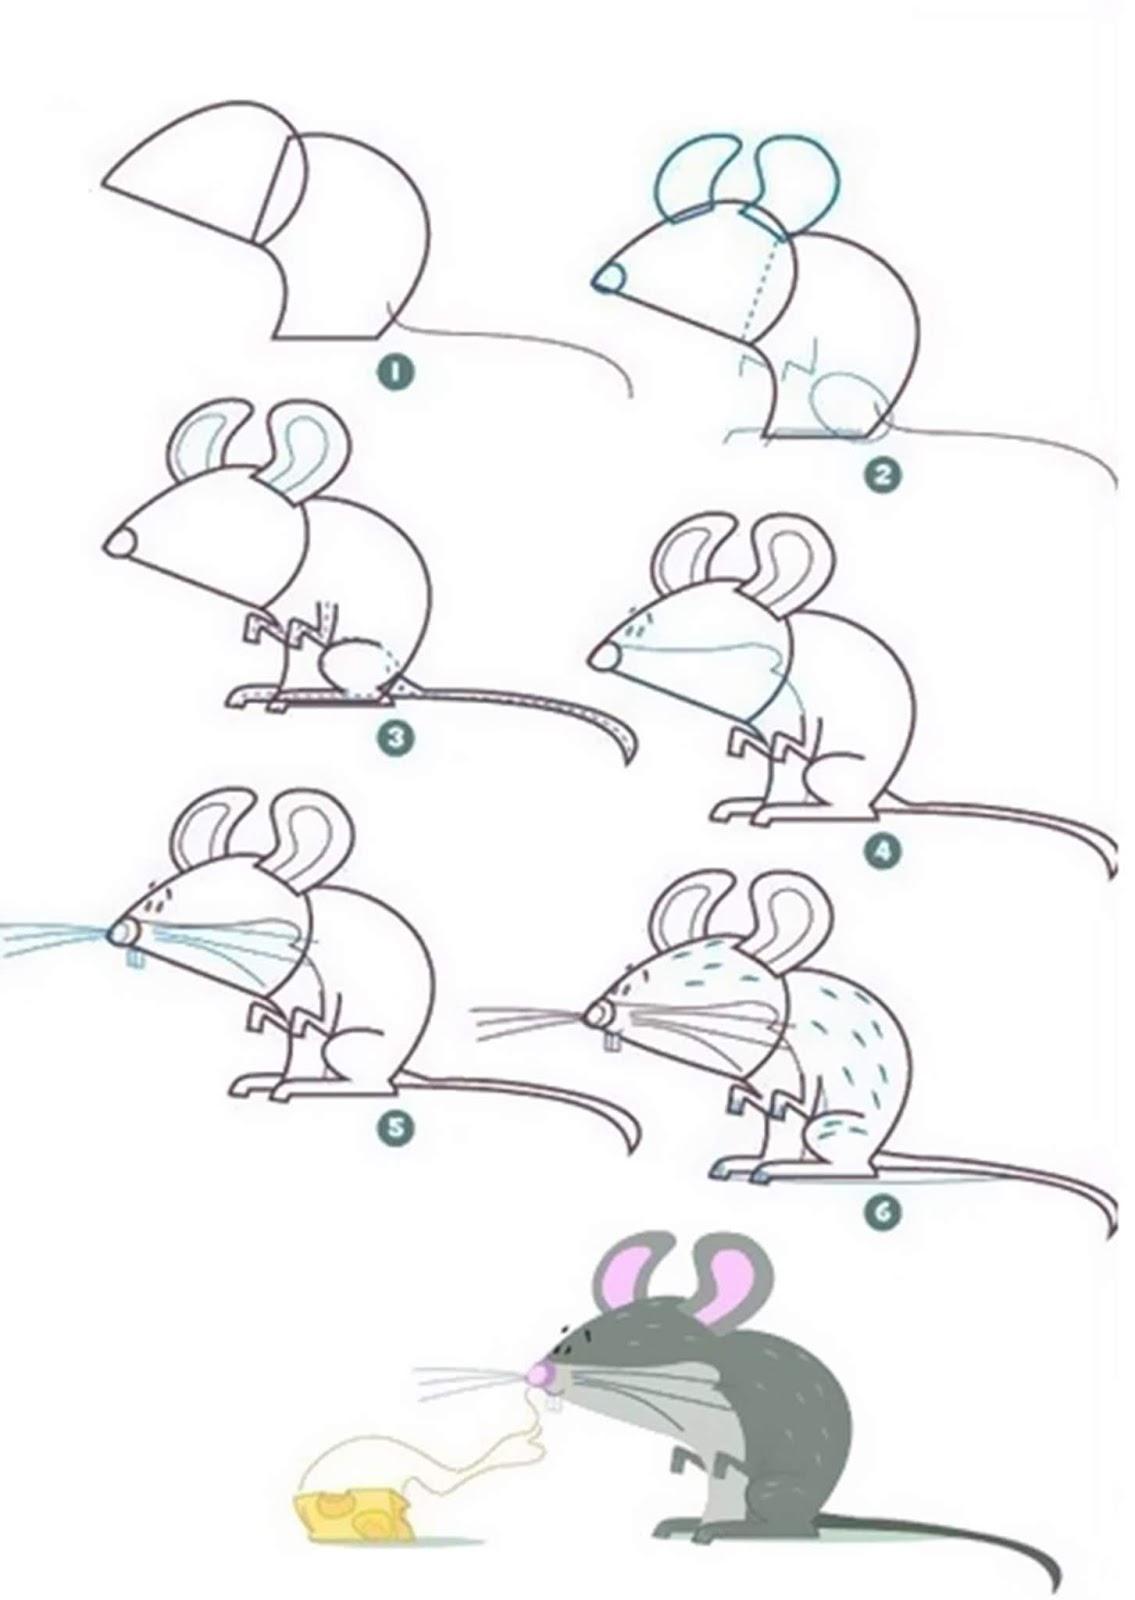 easy animal drawings step by step easy animal drawings cute easy animal drawings for beginners